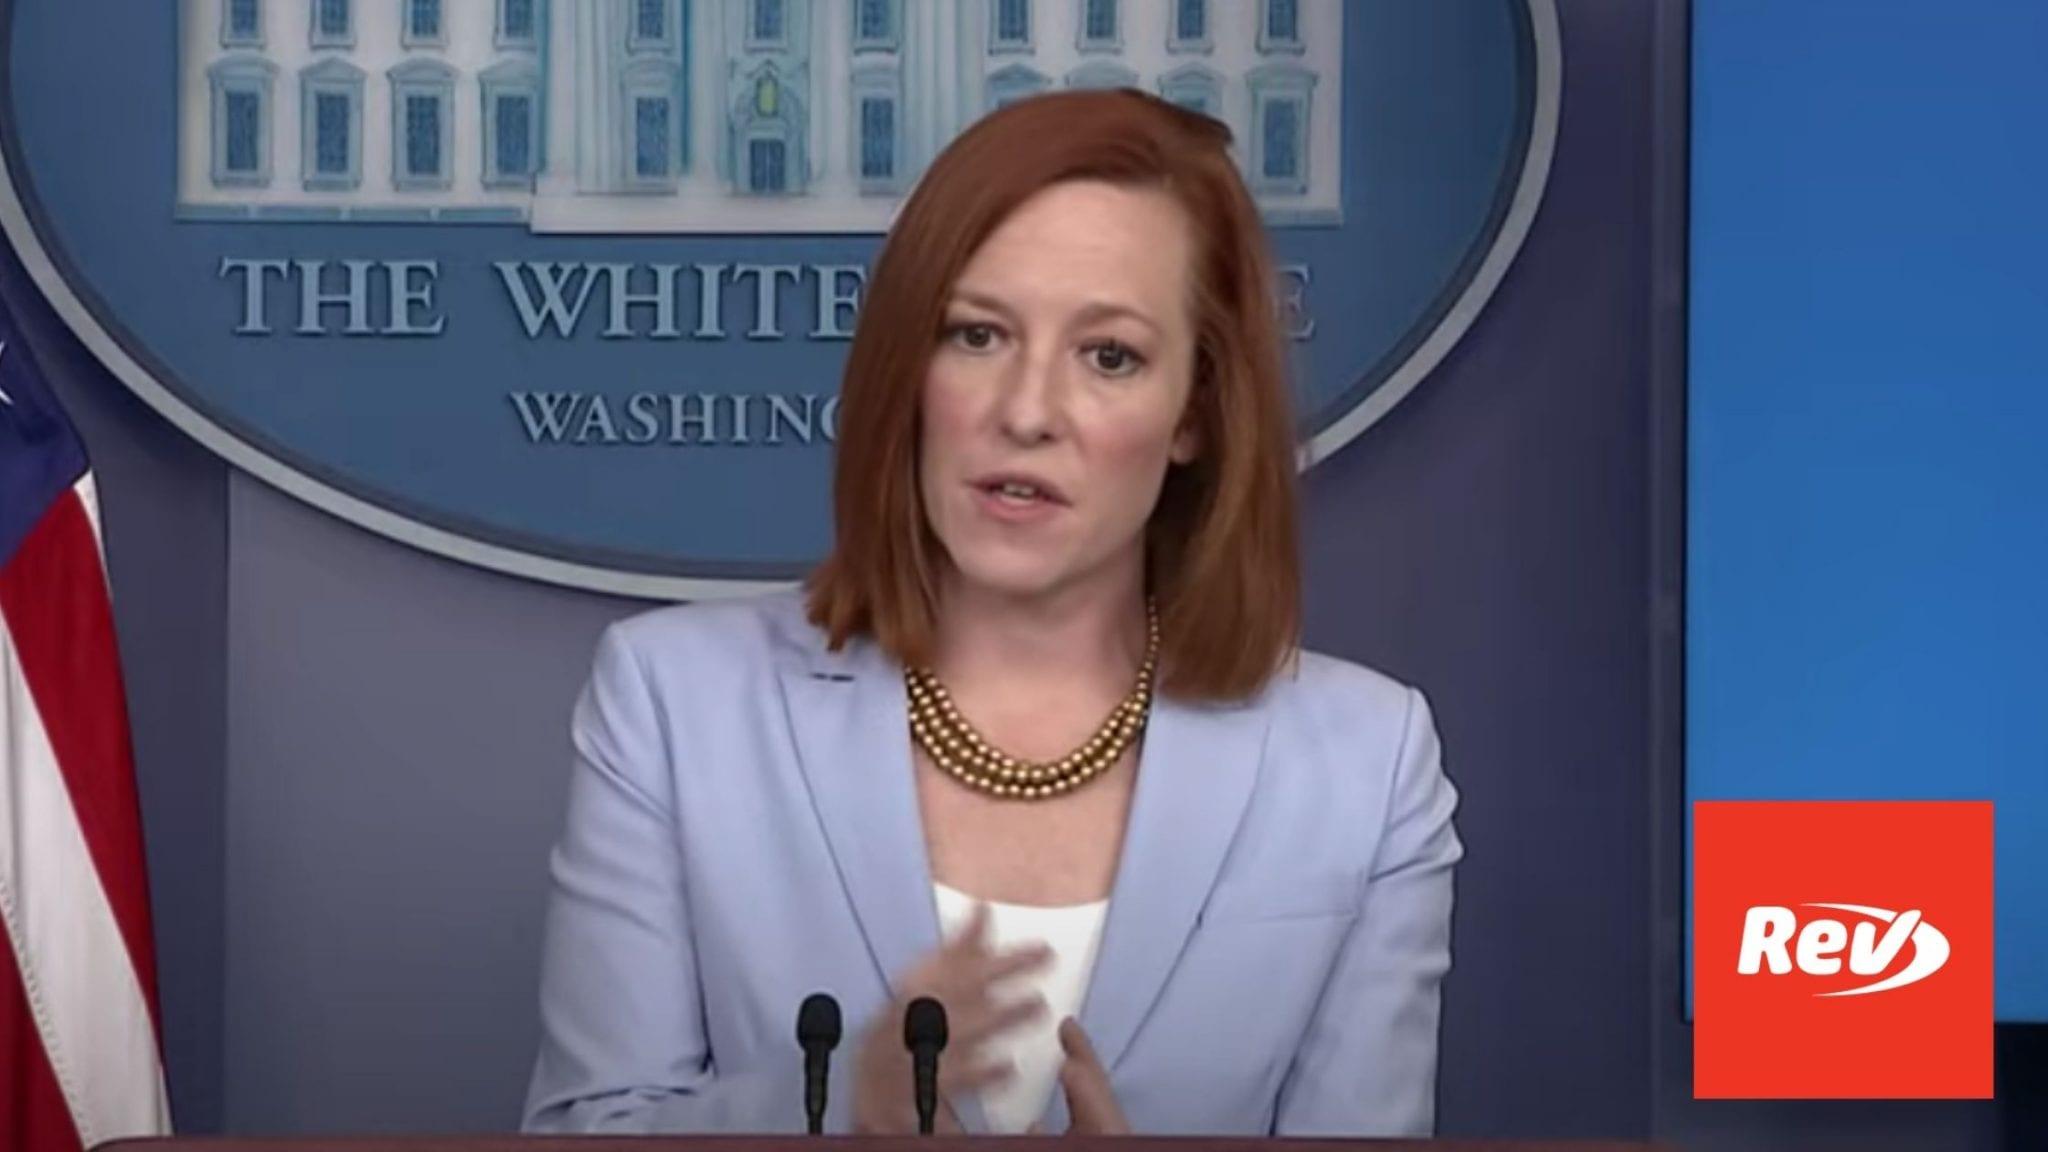 Press Secretary Jen Psaki White House Press Conference Transcript May 21